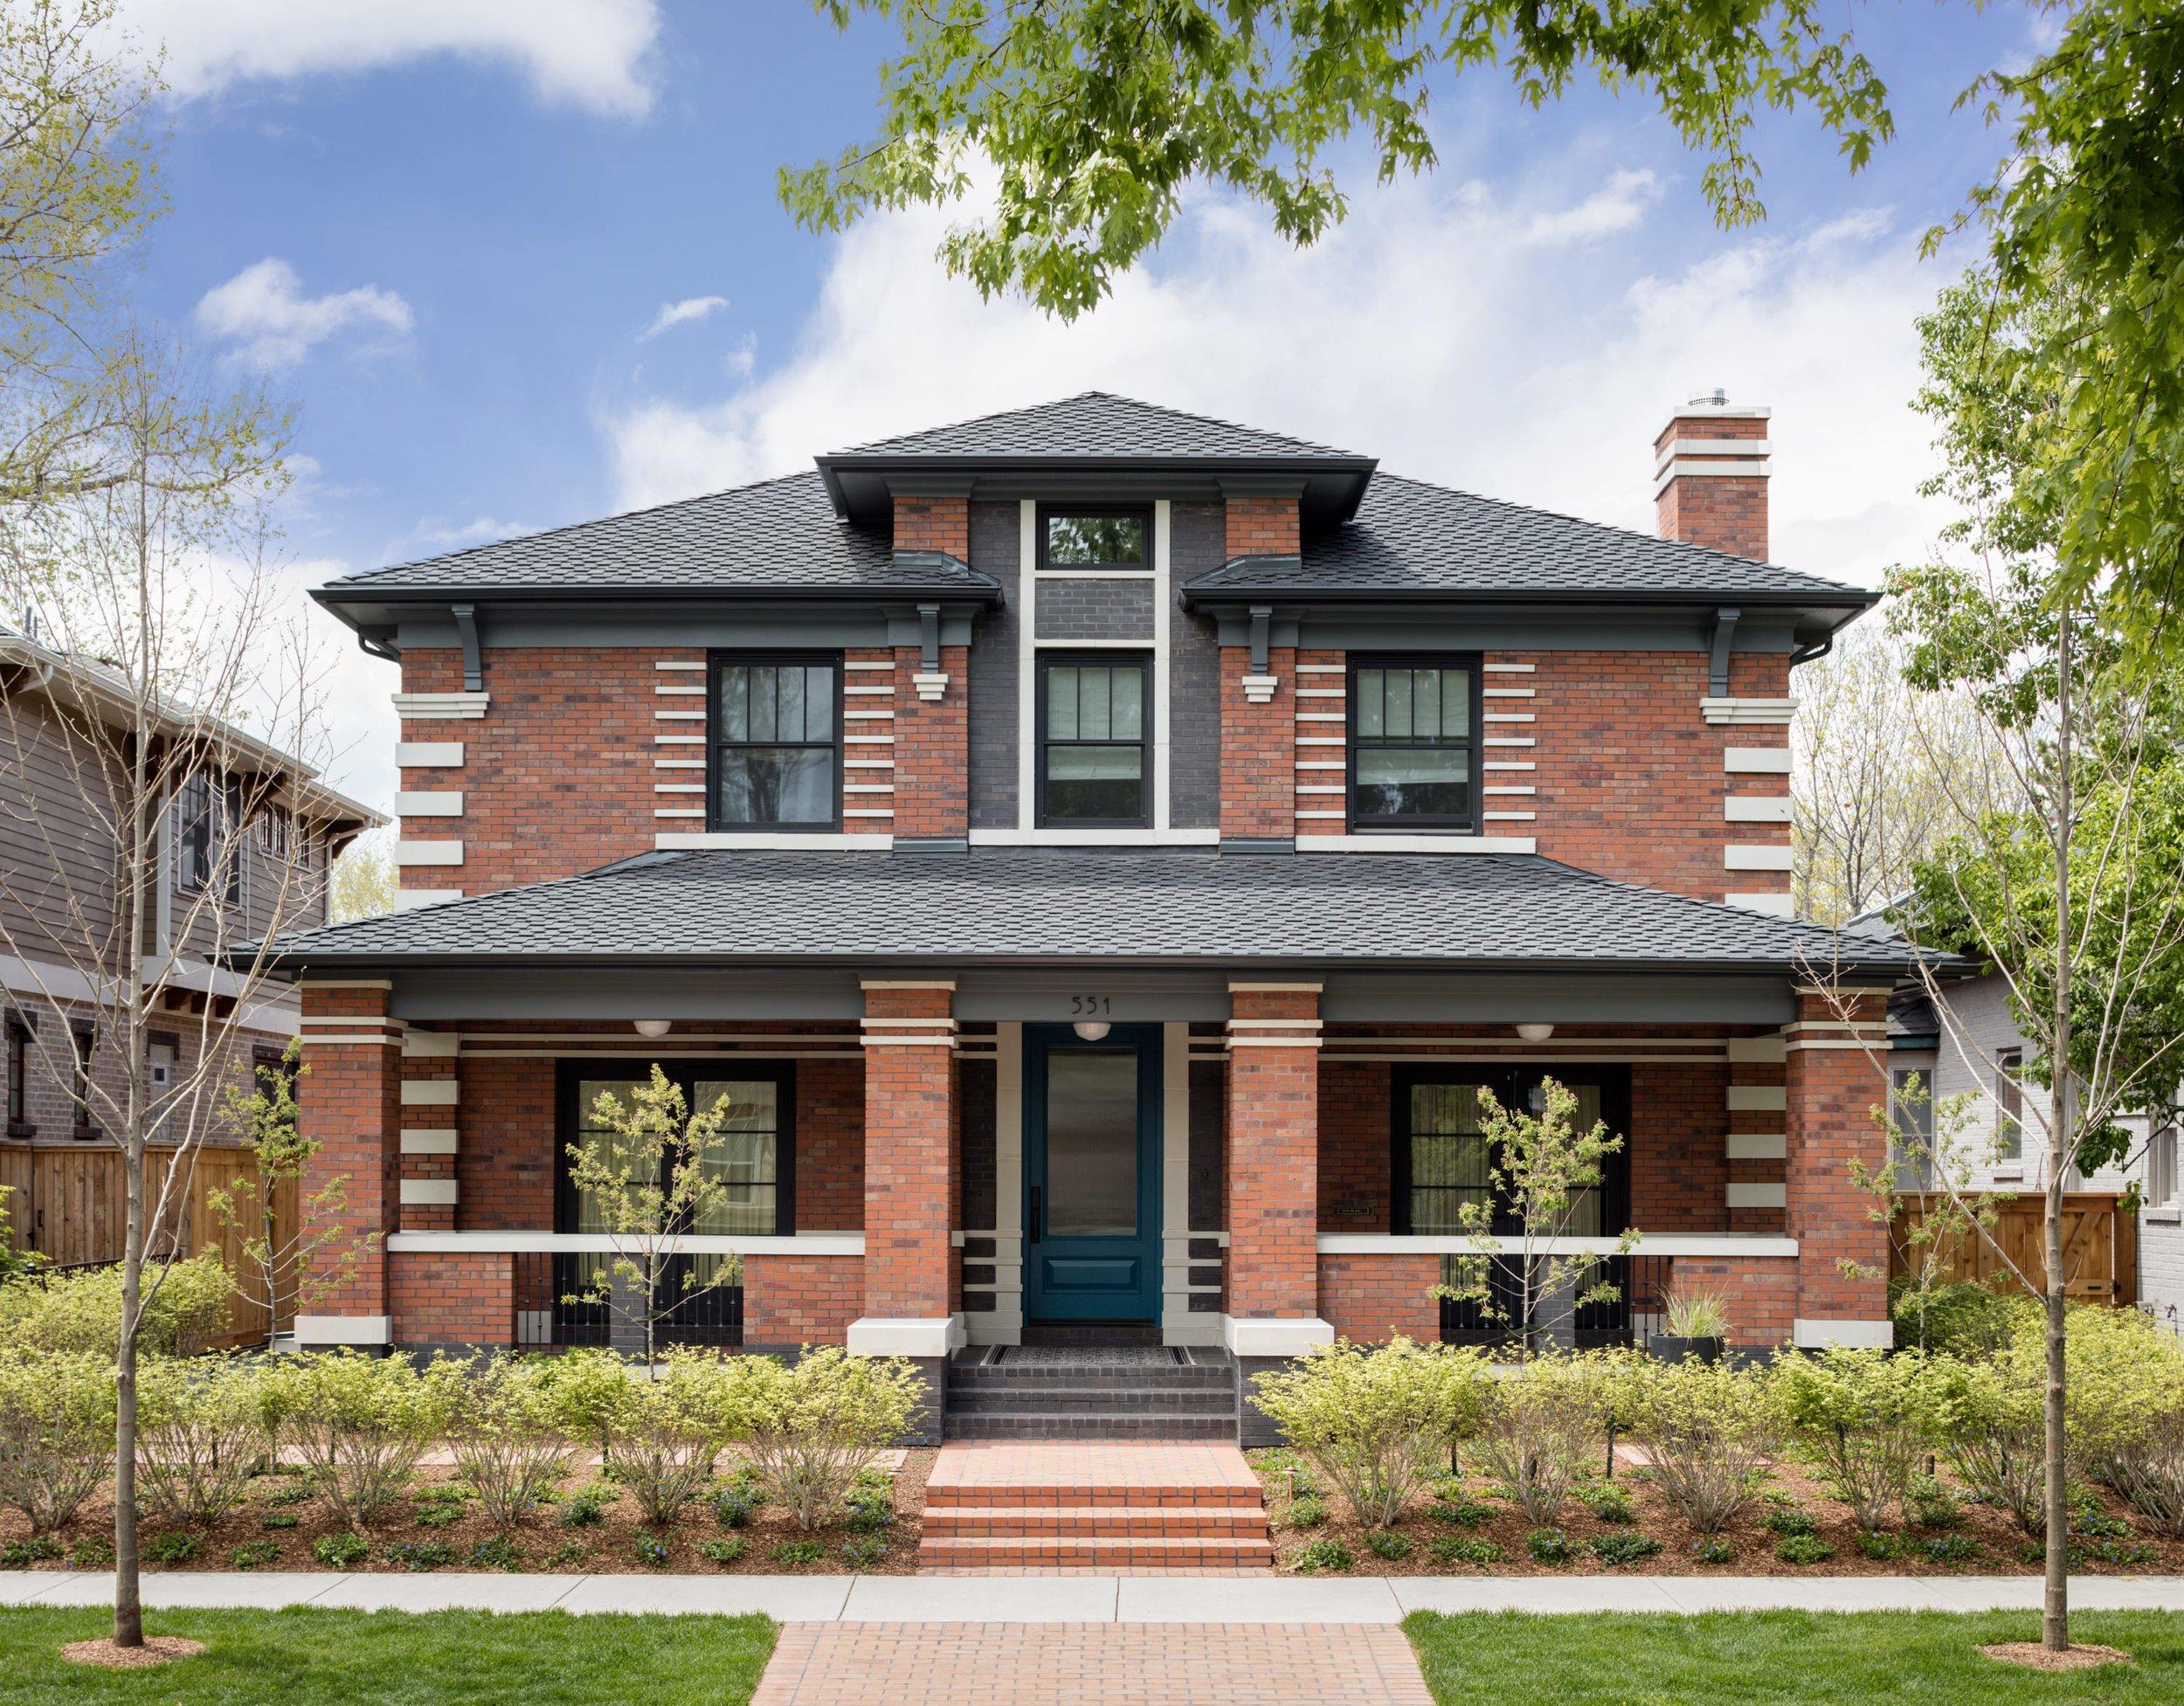 symmetry-home.jpg